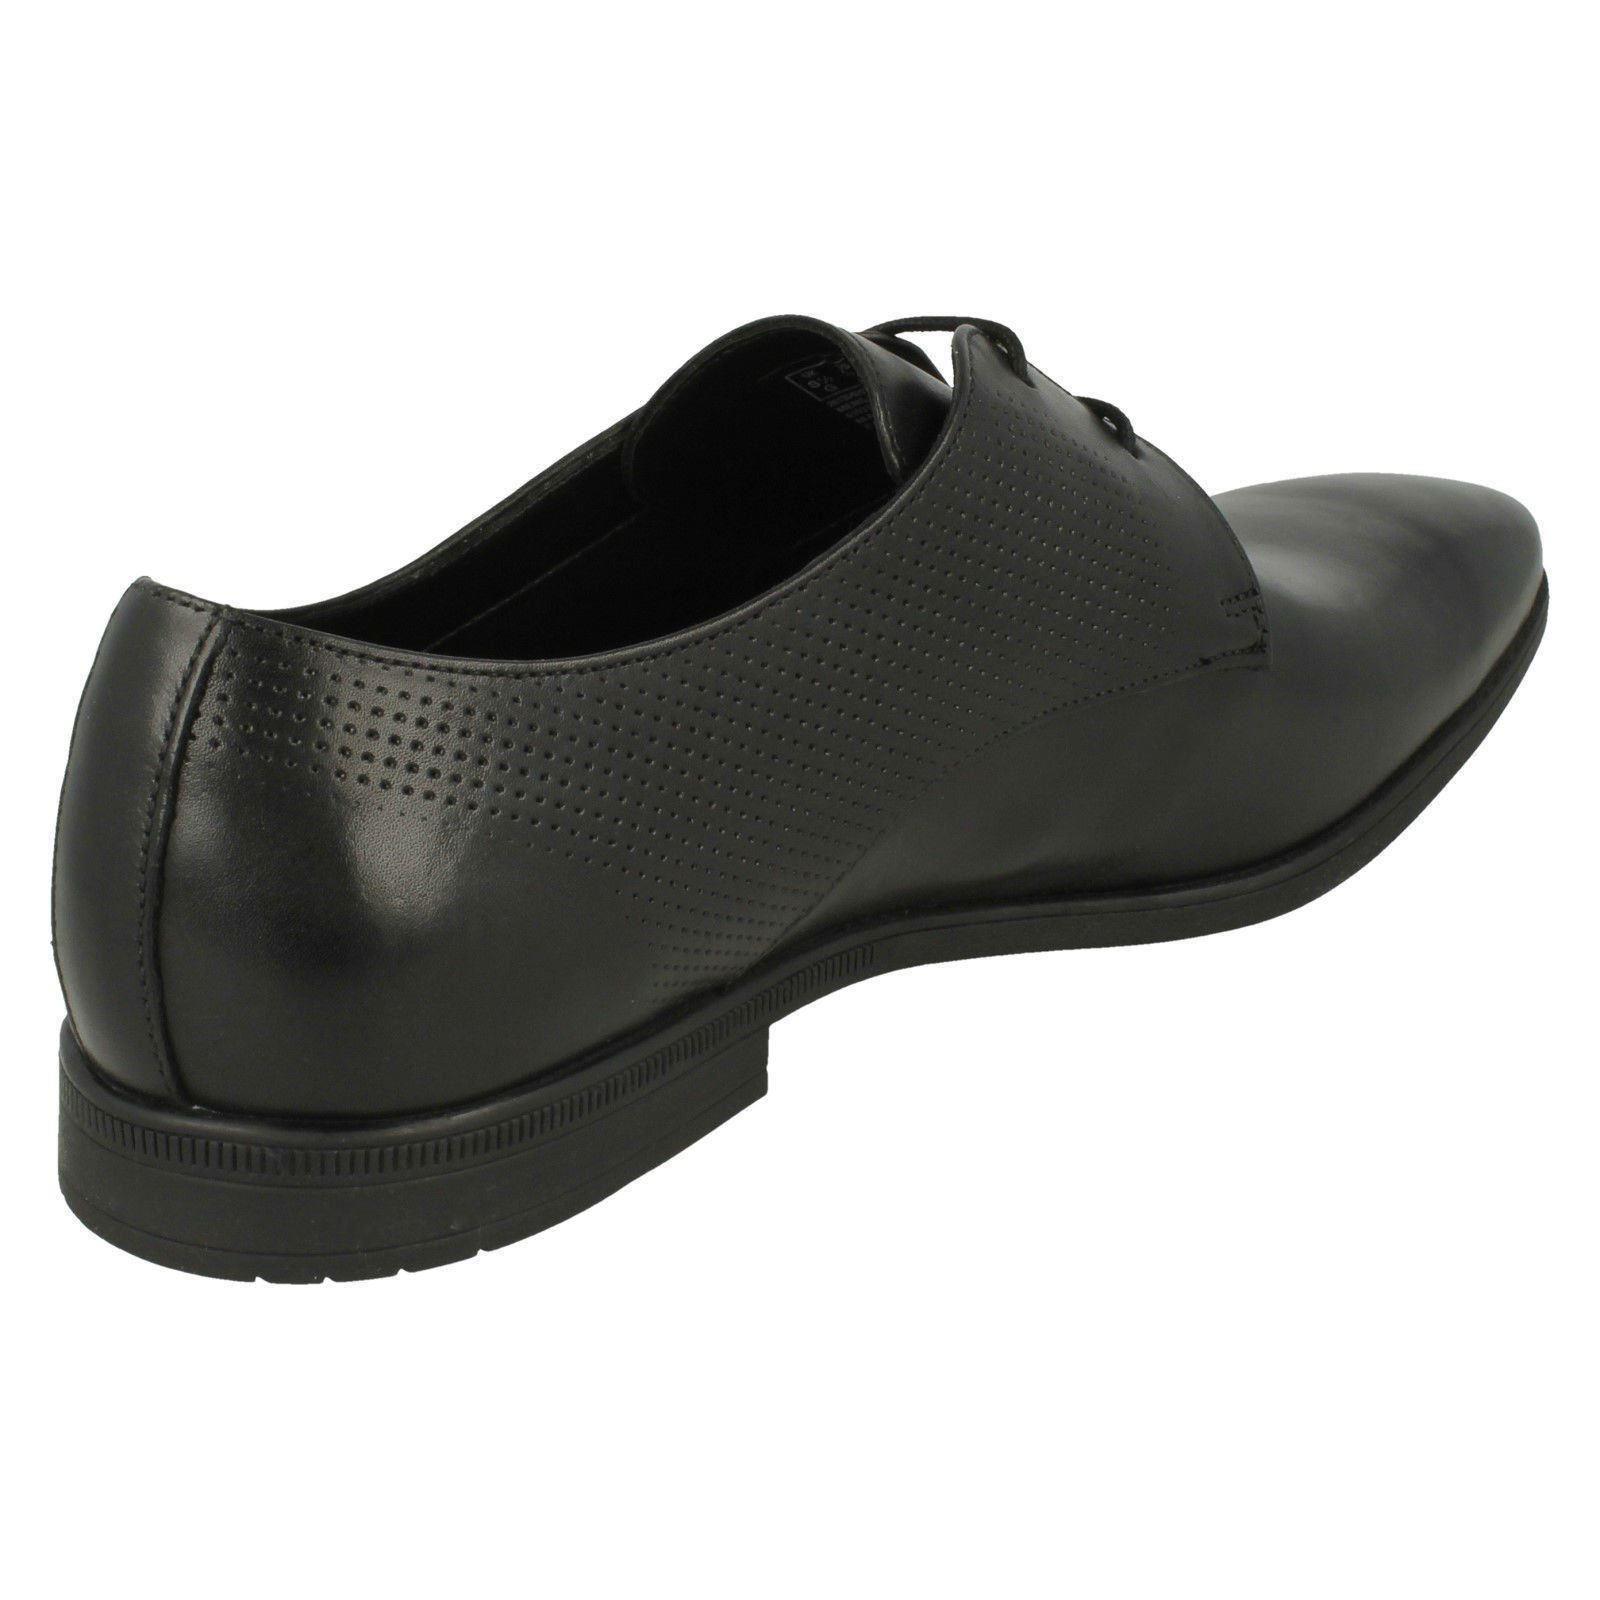 Formal para Zapatos con cordones para Formal hombre 'Bampton Walk' 399c11